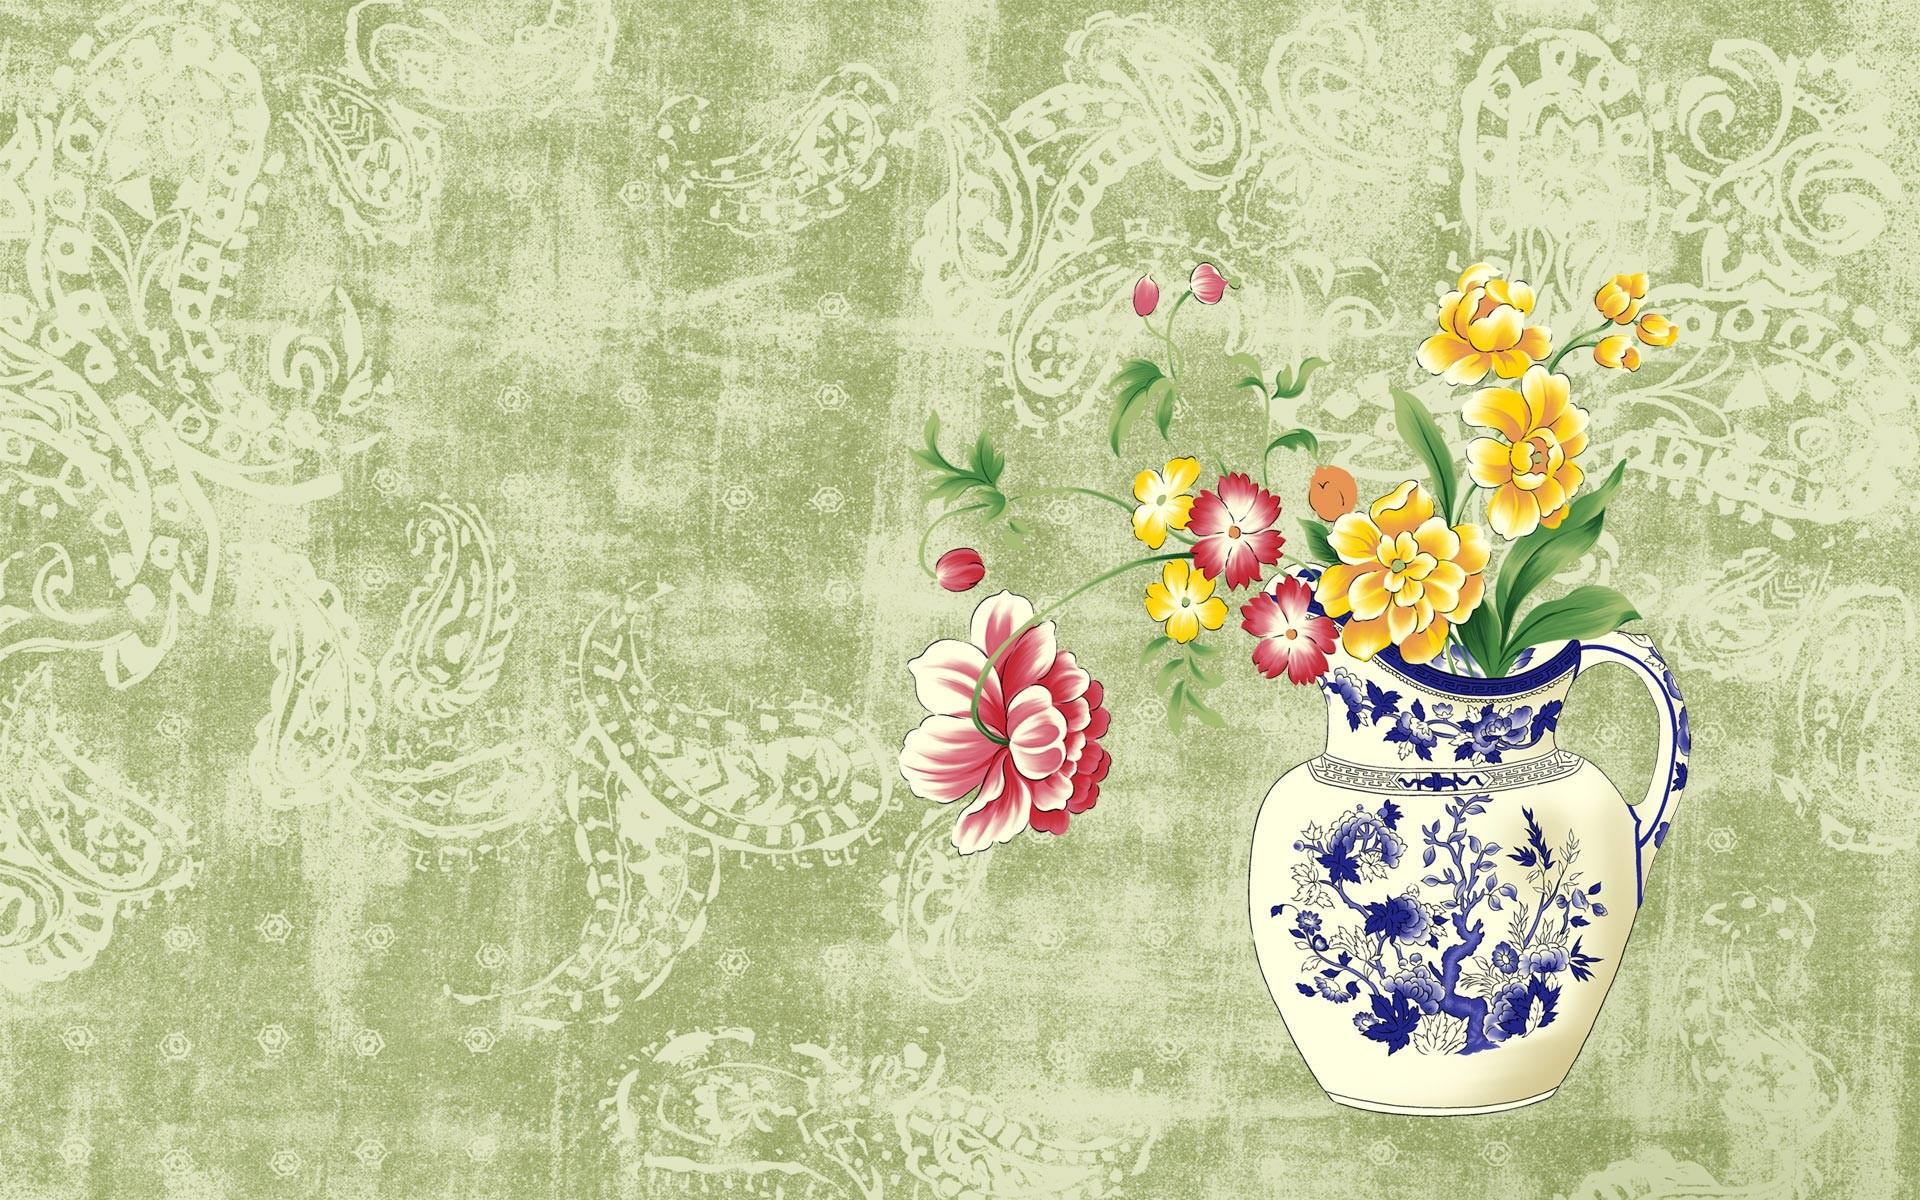 Desktop Wallpaper · Gallery · Windows 7 · Japanese-style painting .